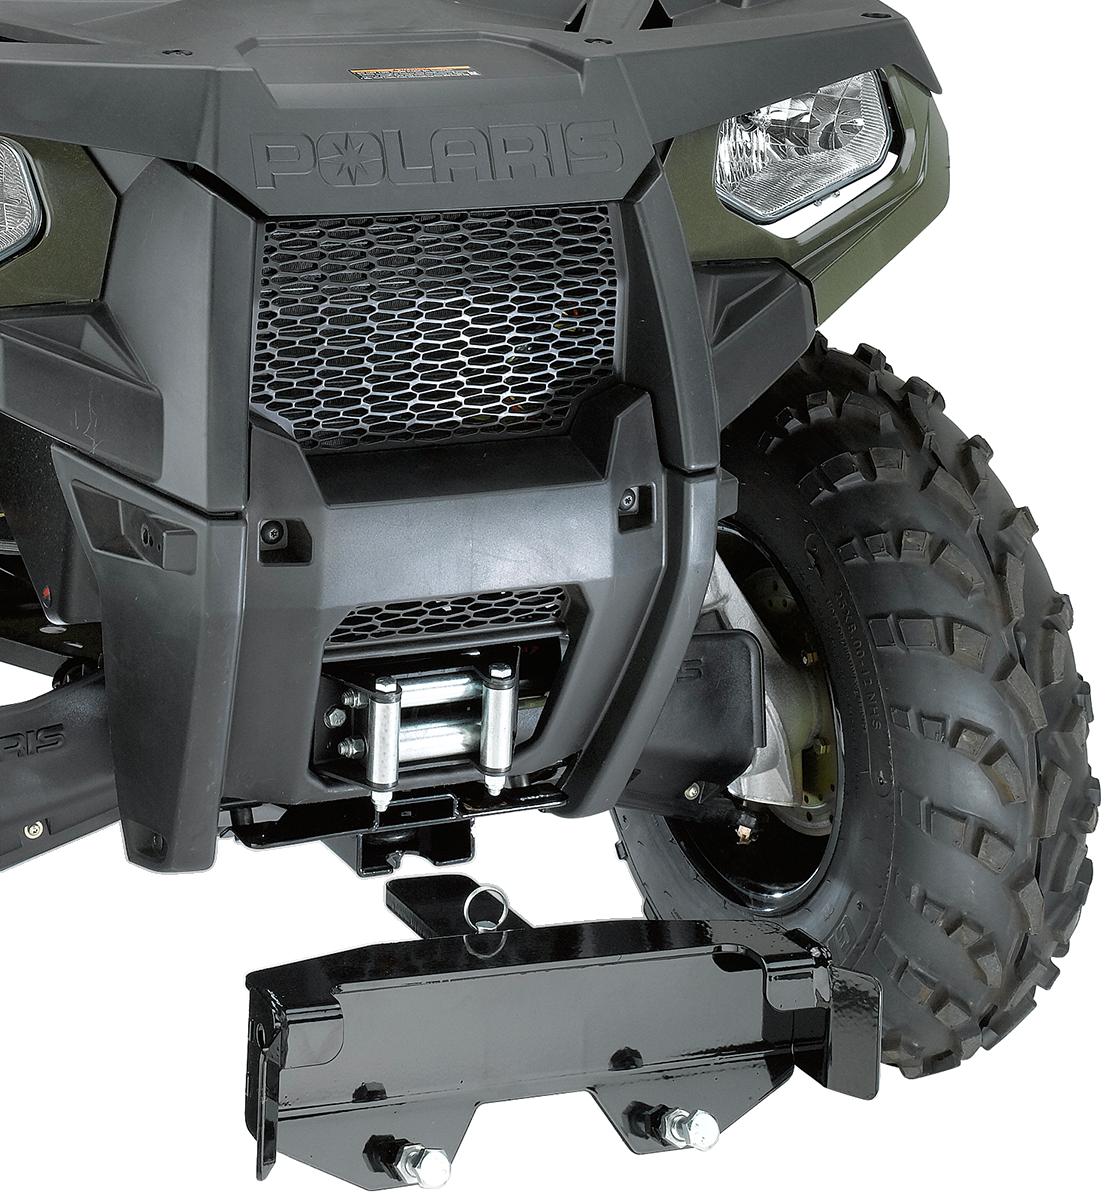 Moose Utility RM4 ATV Snow Plow Mounting Plate 11-14 Polaris Sportsman 400 800